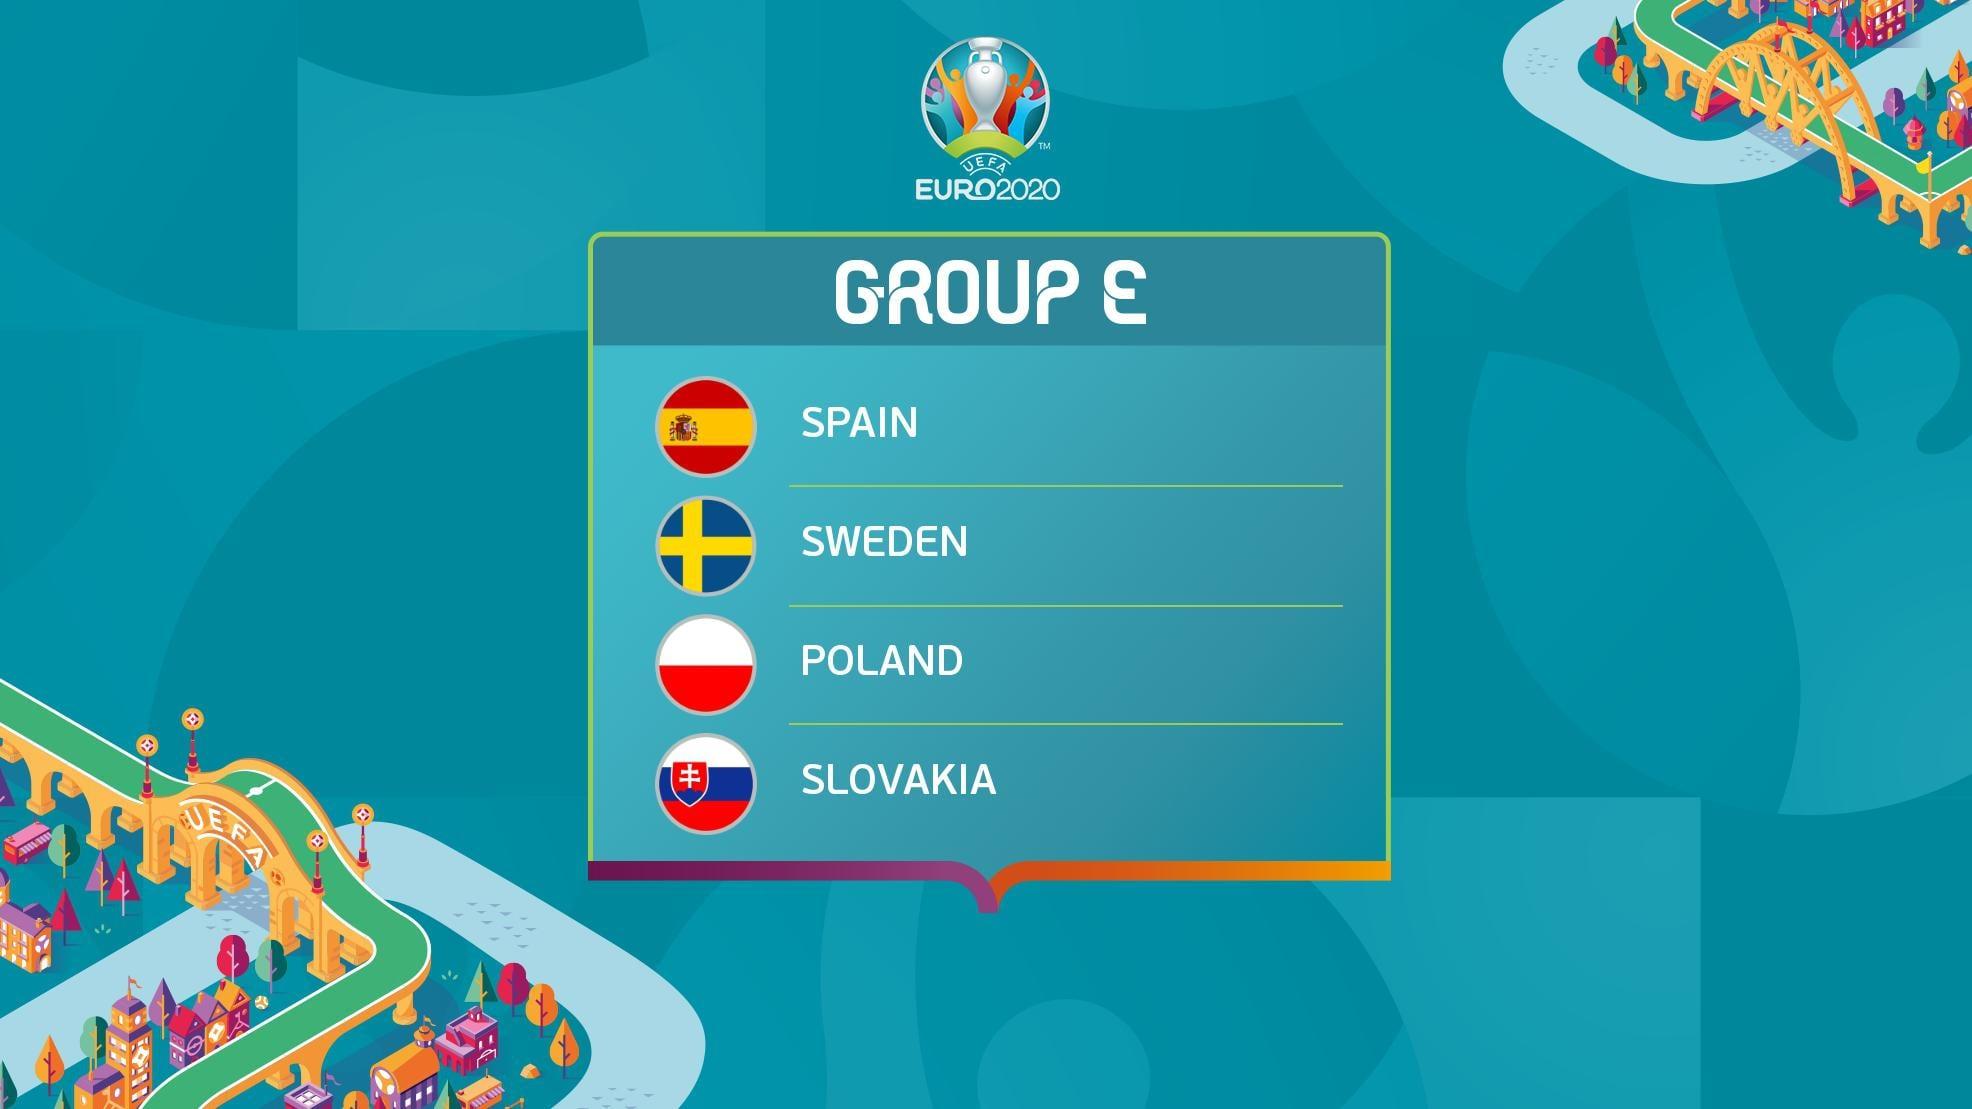 UEFA EURO 2020 Group E: Spain, Sweden, Poland, Slovakia | UEFA EURO 2020 |  UEFA.com